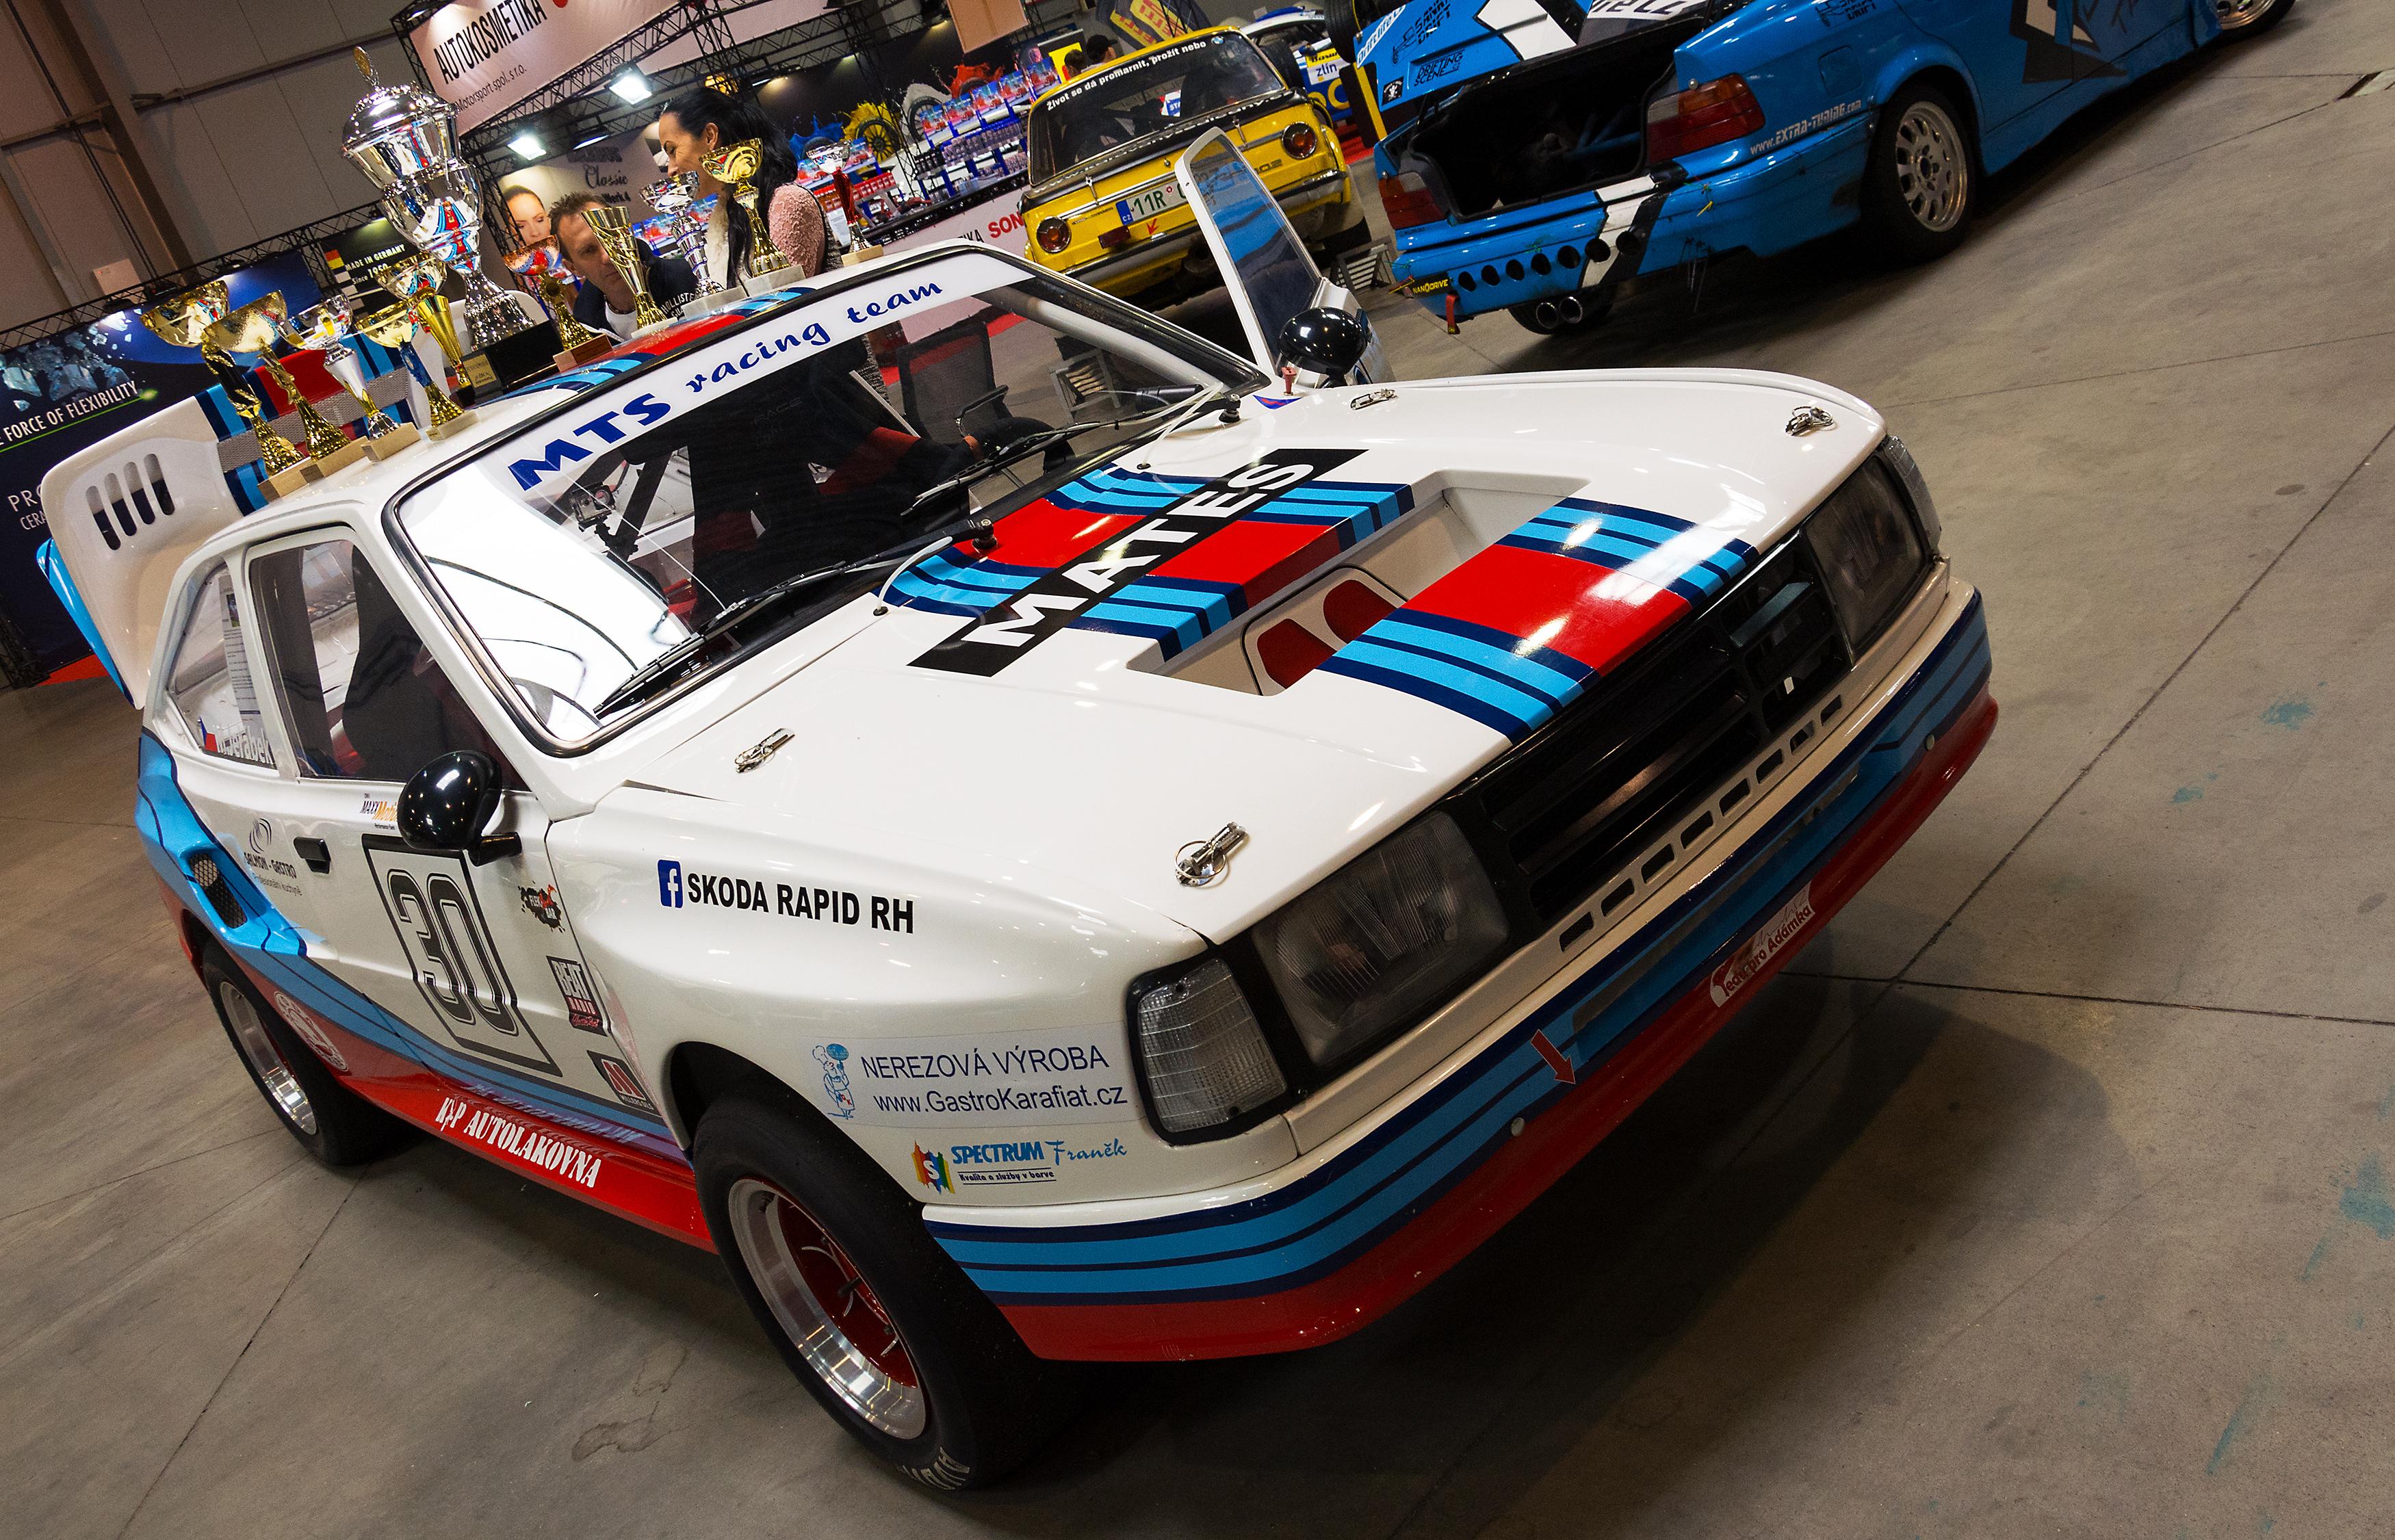 Free Image: Old Rally Car | Libreshot Free Stock Photos